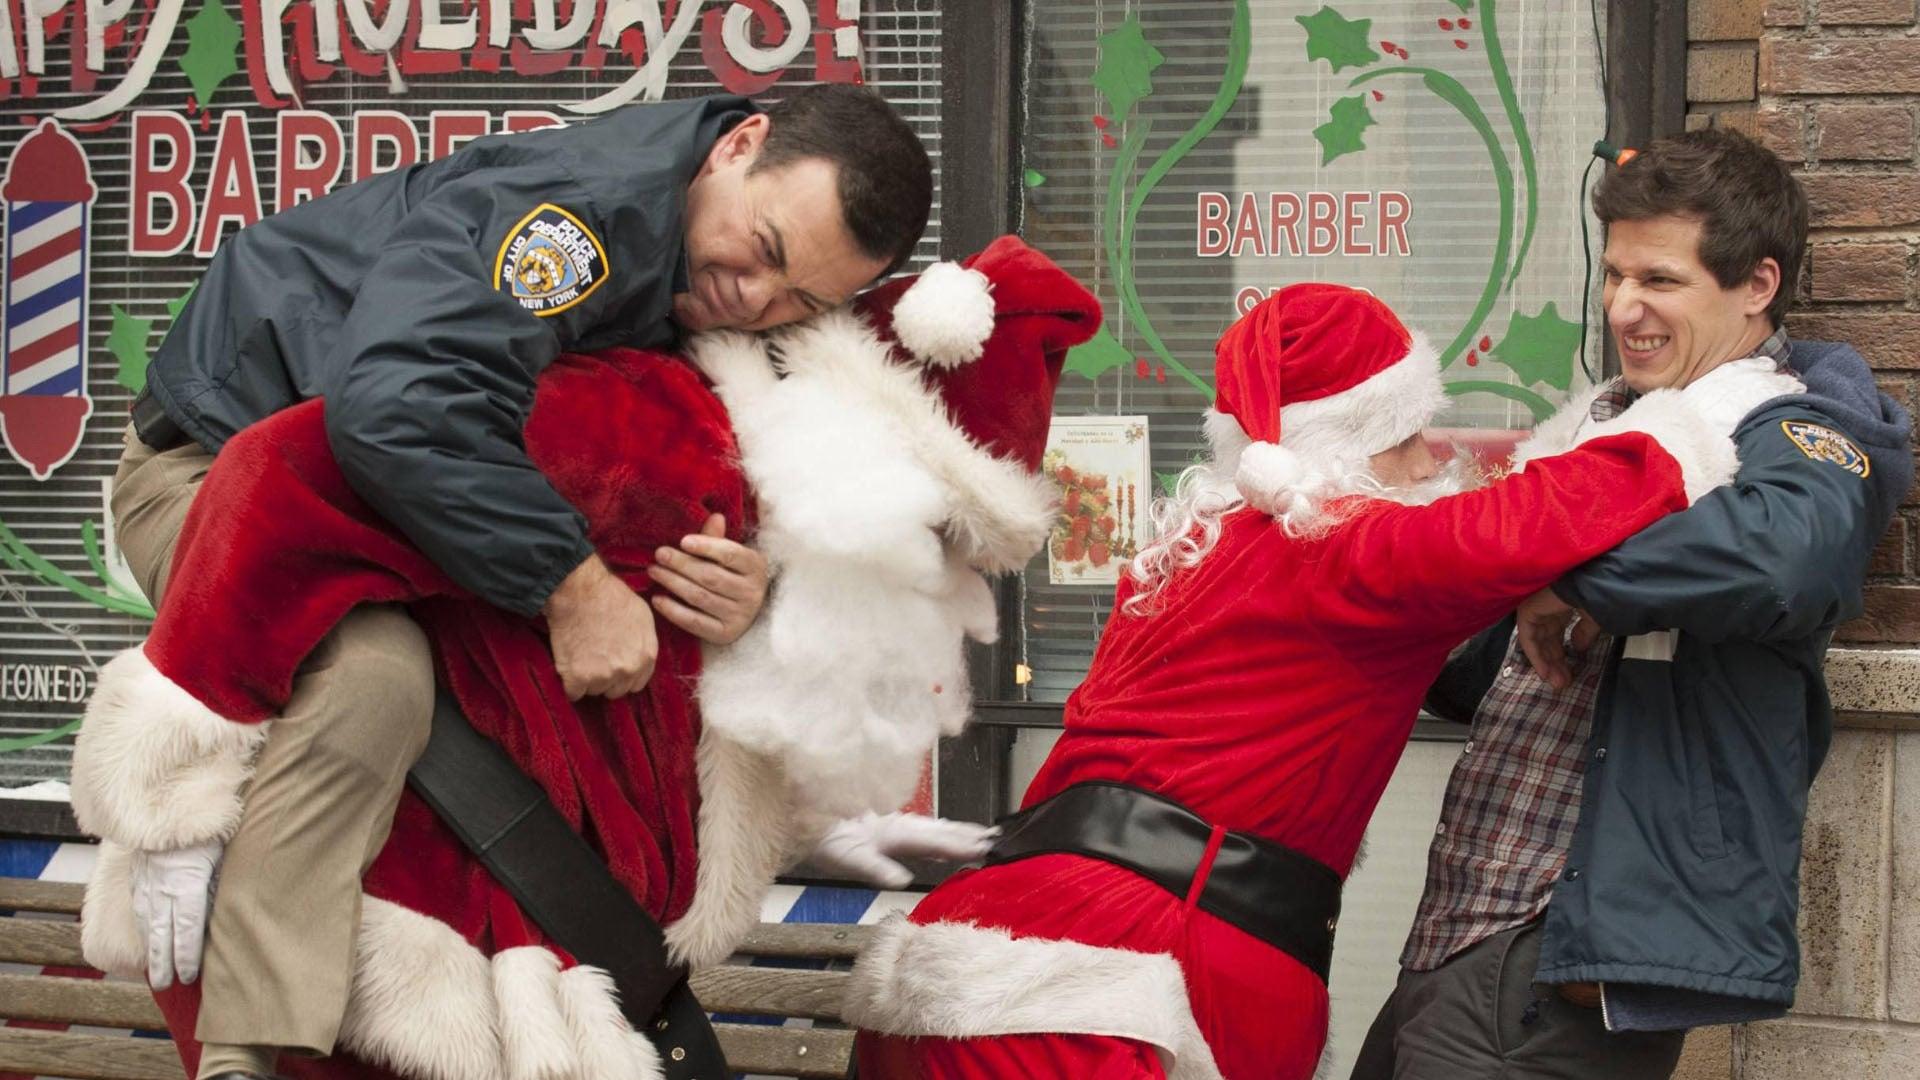 Brooklyn Nine-Nine - Season 1 Episode 11 : Christmas